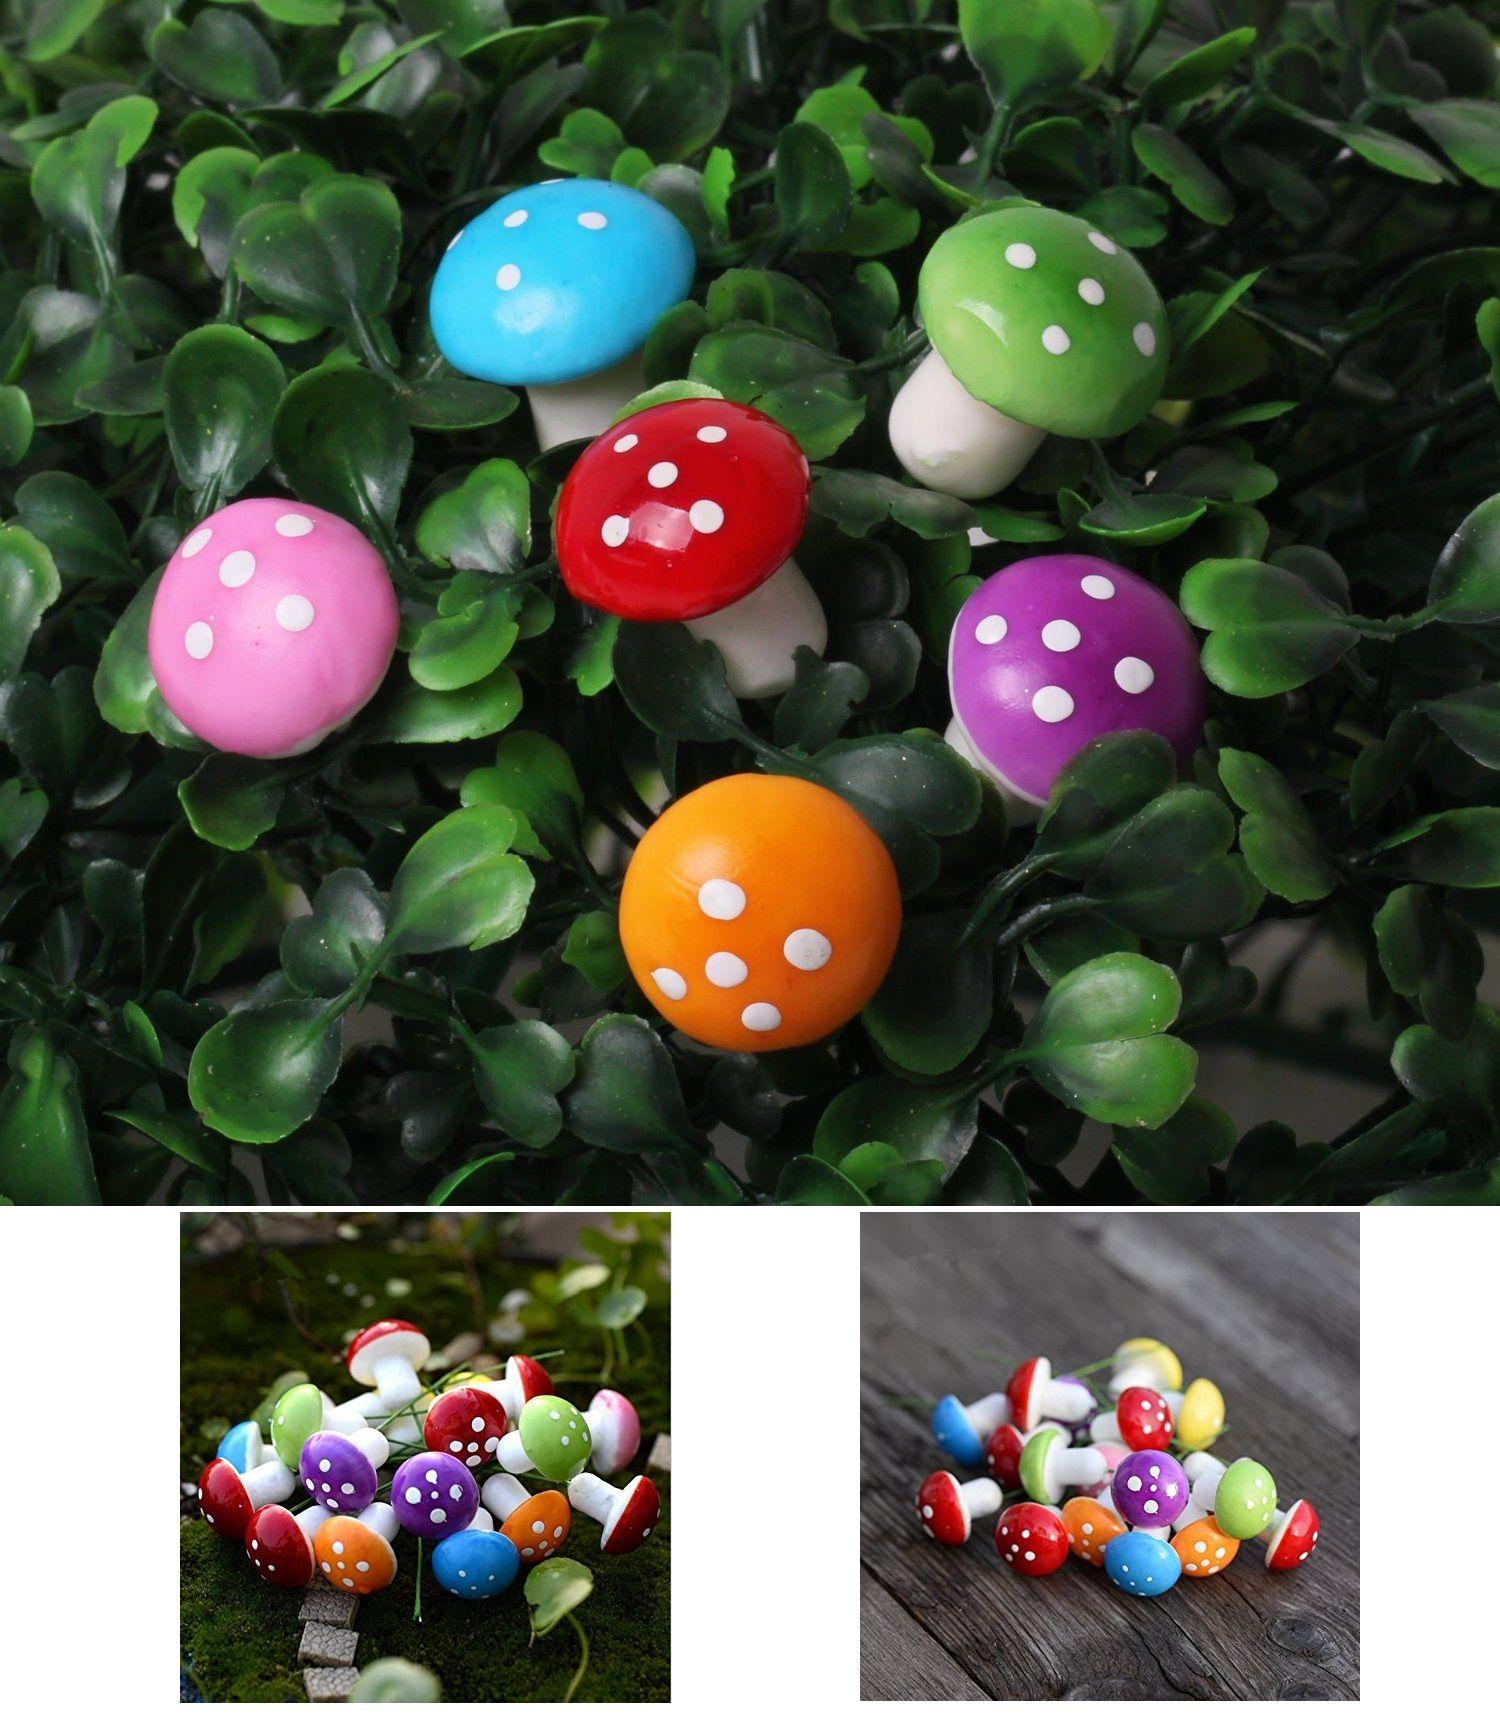 60pcs Mini Miniature Plant Pots Fairy Foam Mushroom Garden Decoration